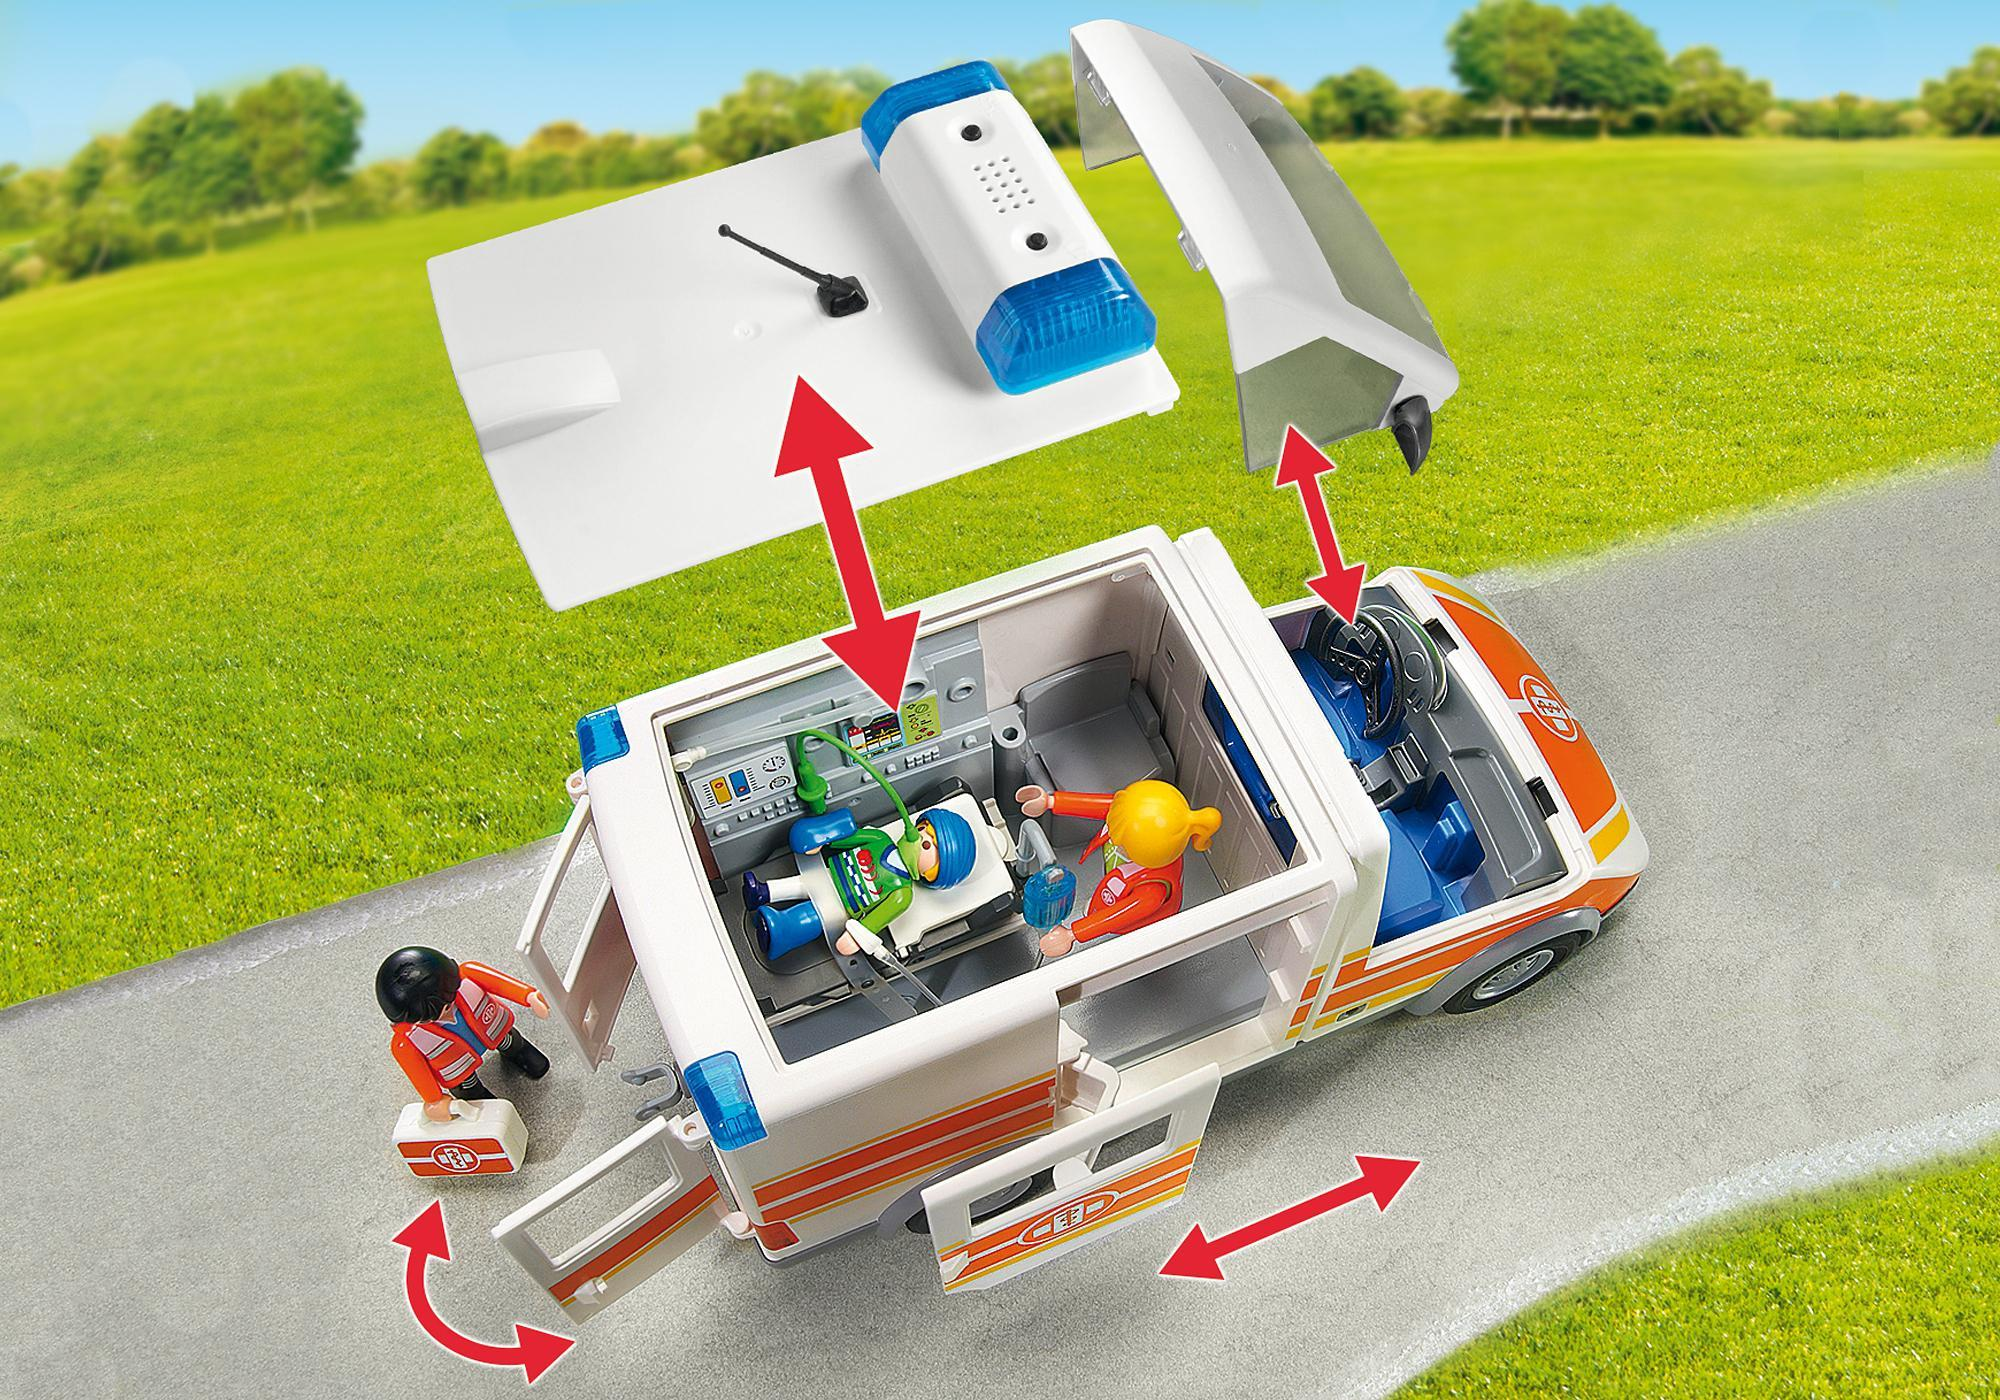 http://media.playmobil.com/i/playmobil/6685_product_extra3/Ambulancia con Luces y Sonido